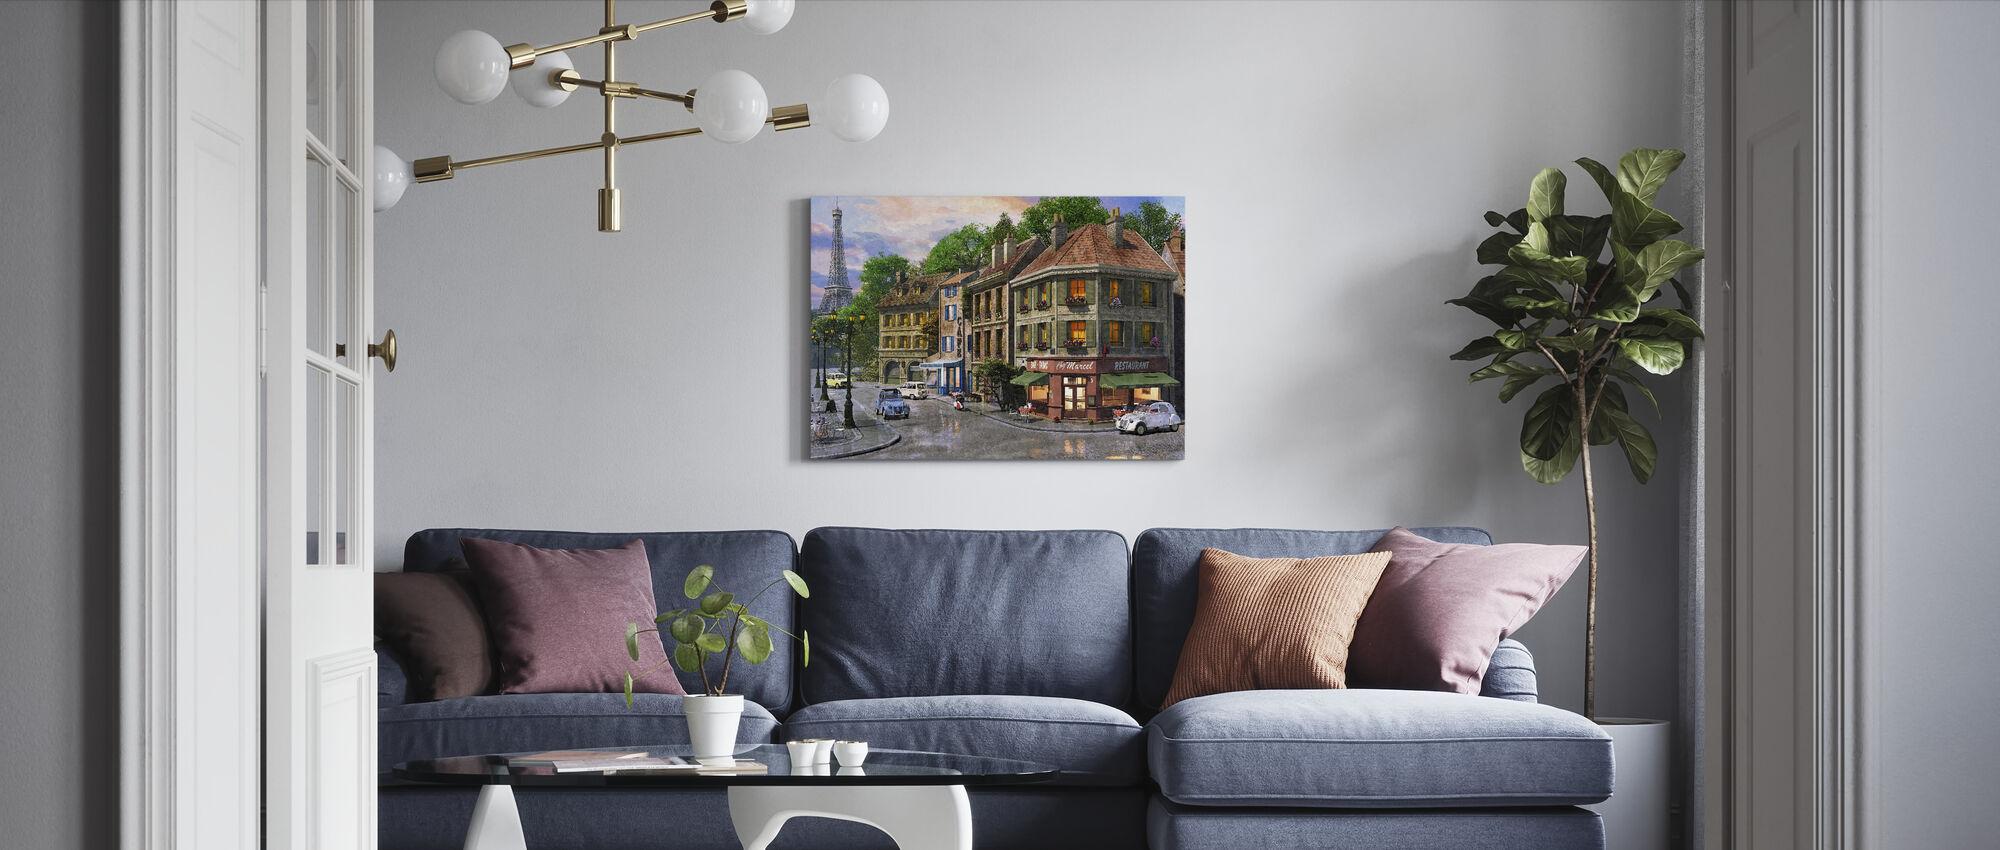 Paris Streets - Canvas print - Living Room